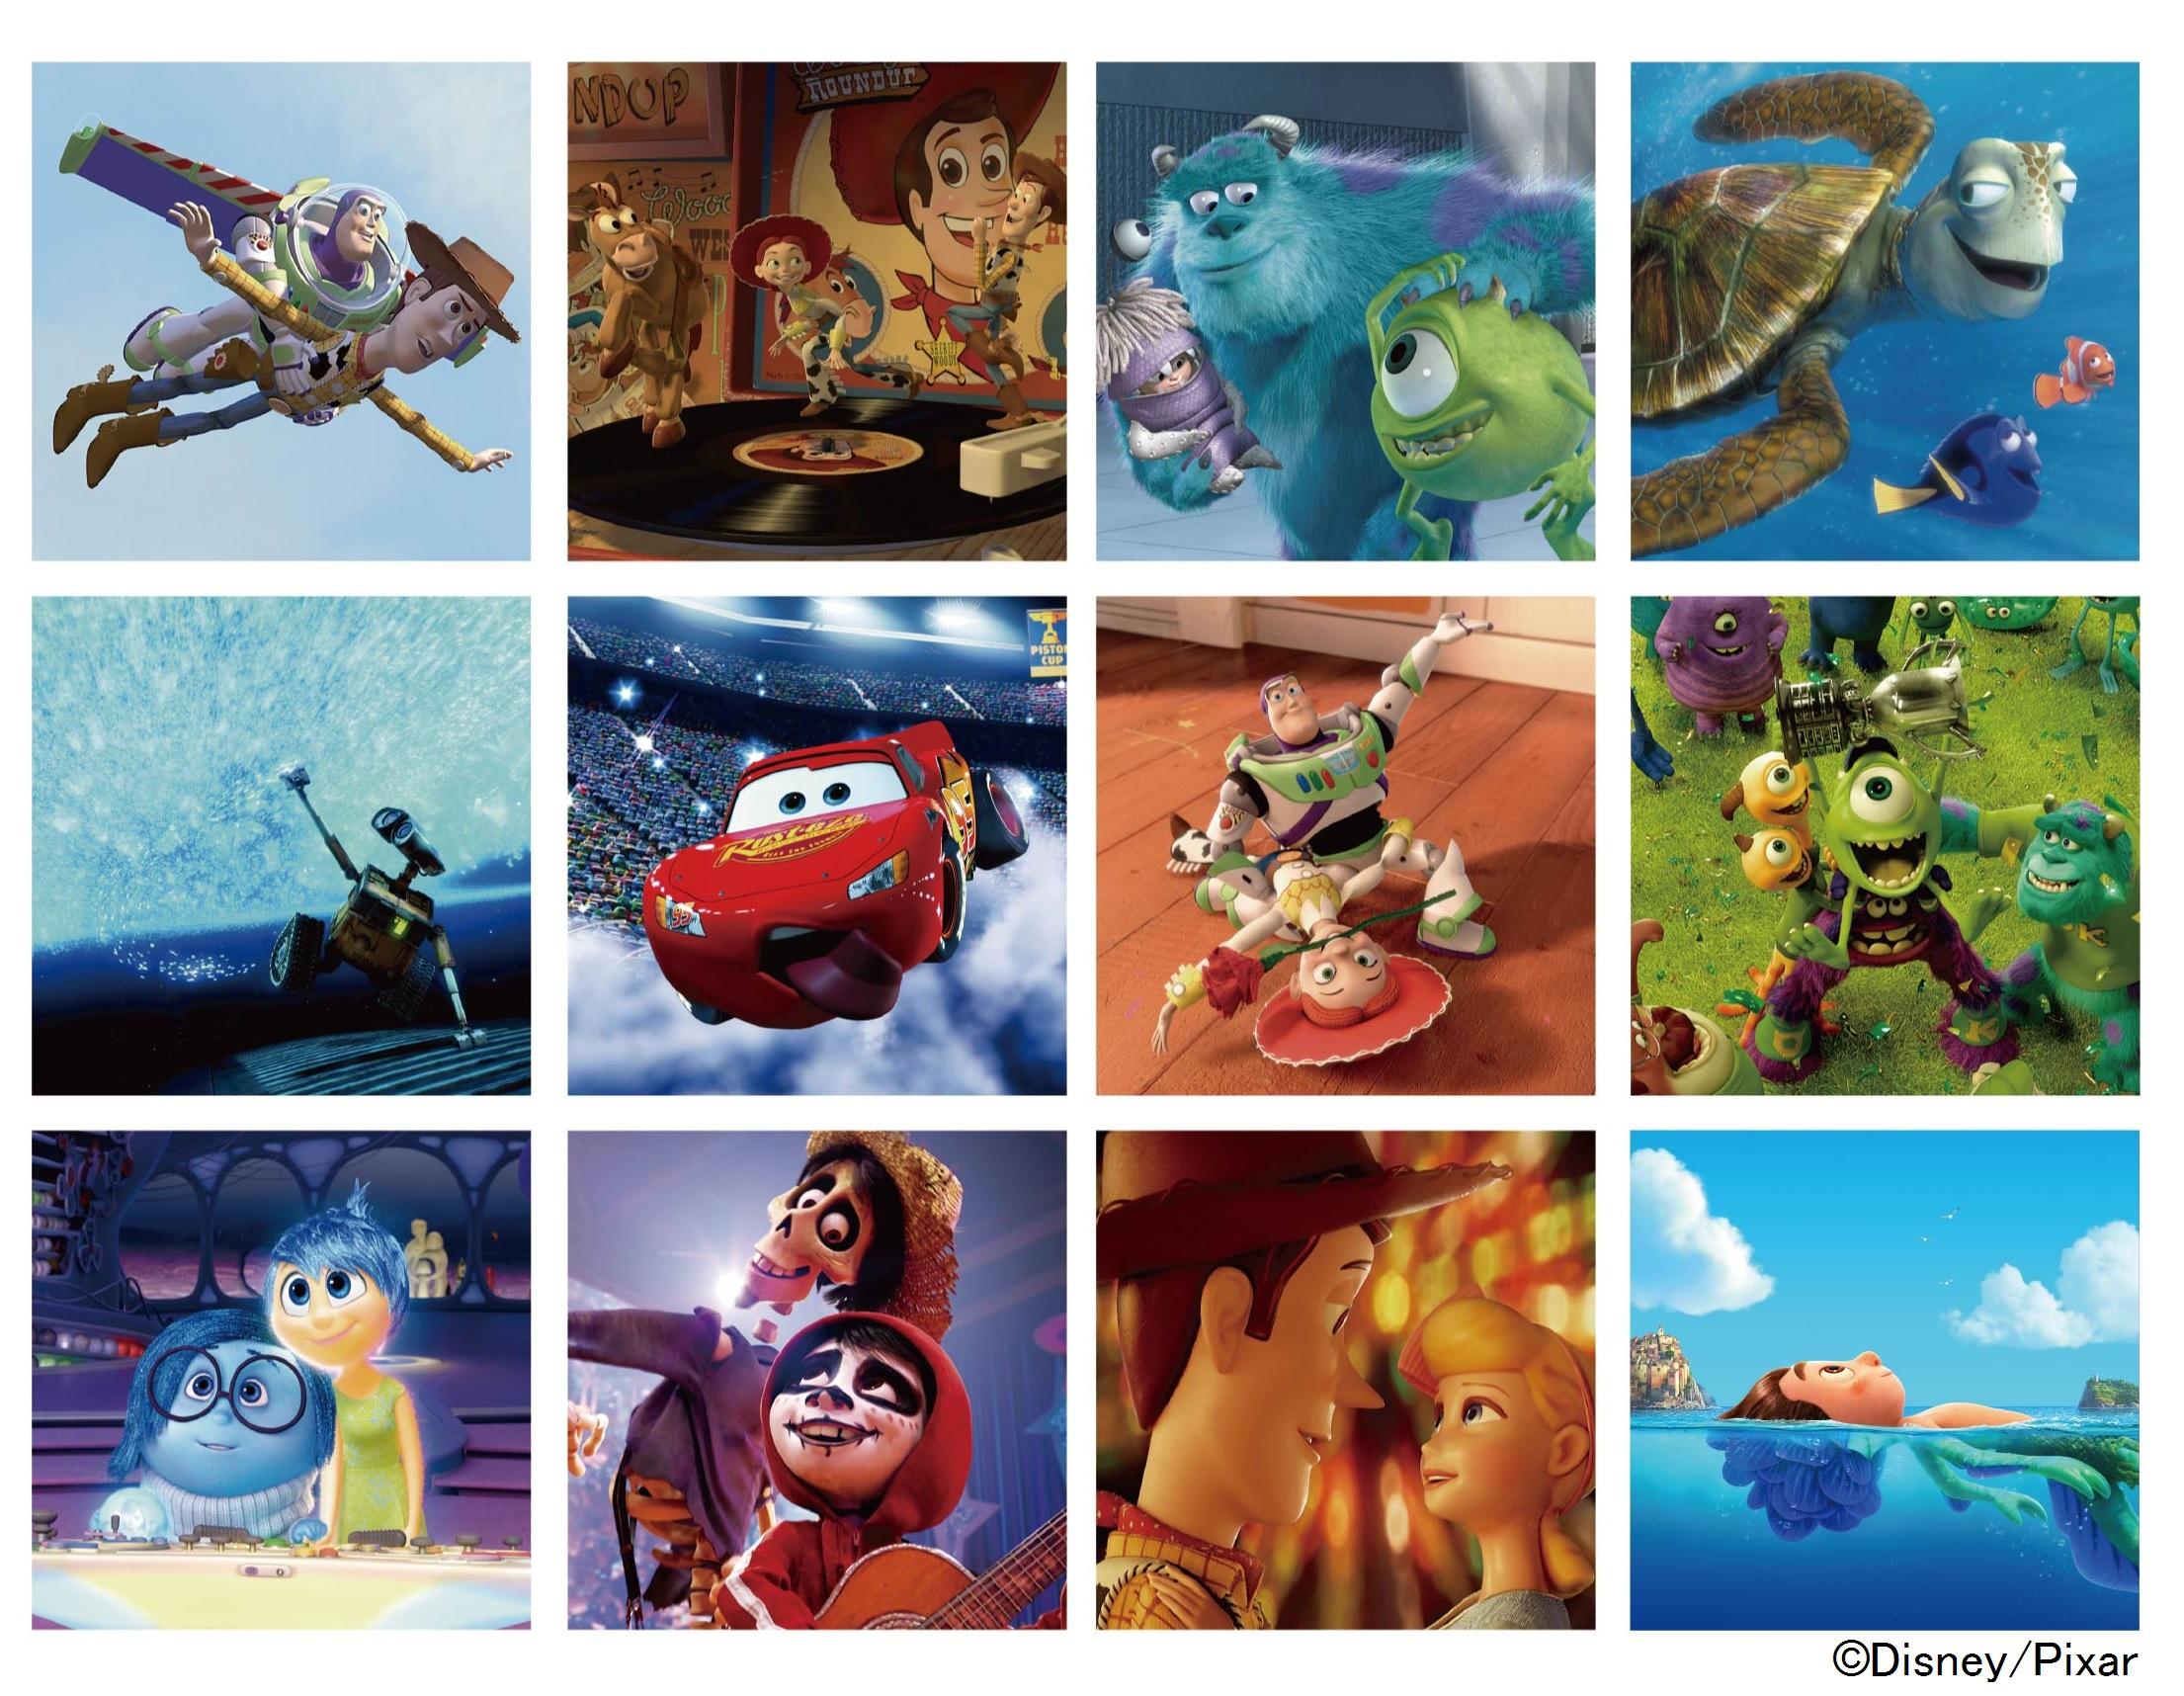 pixar-pixar-pixar%ef%bc%88%e3%83%94%e3%82%af%e3%82%b5%e3%83%bc%ef%bc%81-%e3%83%94%e3%82%af%e3%82%b5%e3%83%bc%ef%bc%81-%e3%83%94%e3%82%af%e3%82%b5%e3%83%bc%ef%bc%81%ef%bc%89-1-2